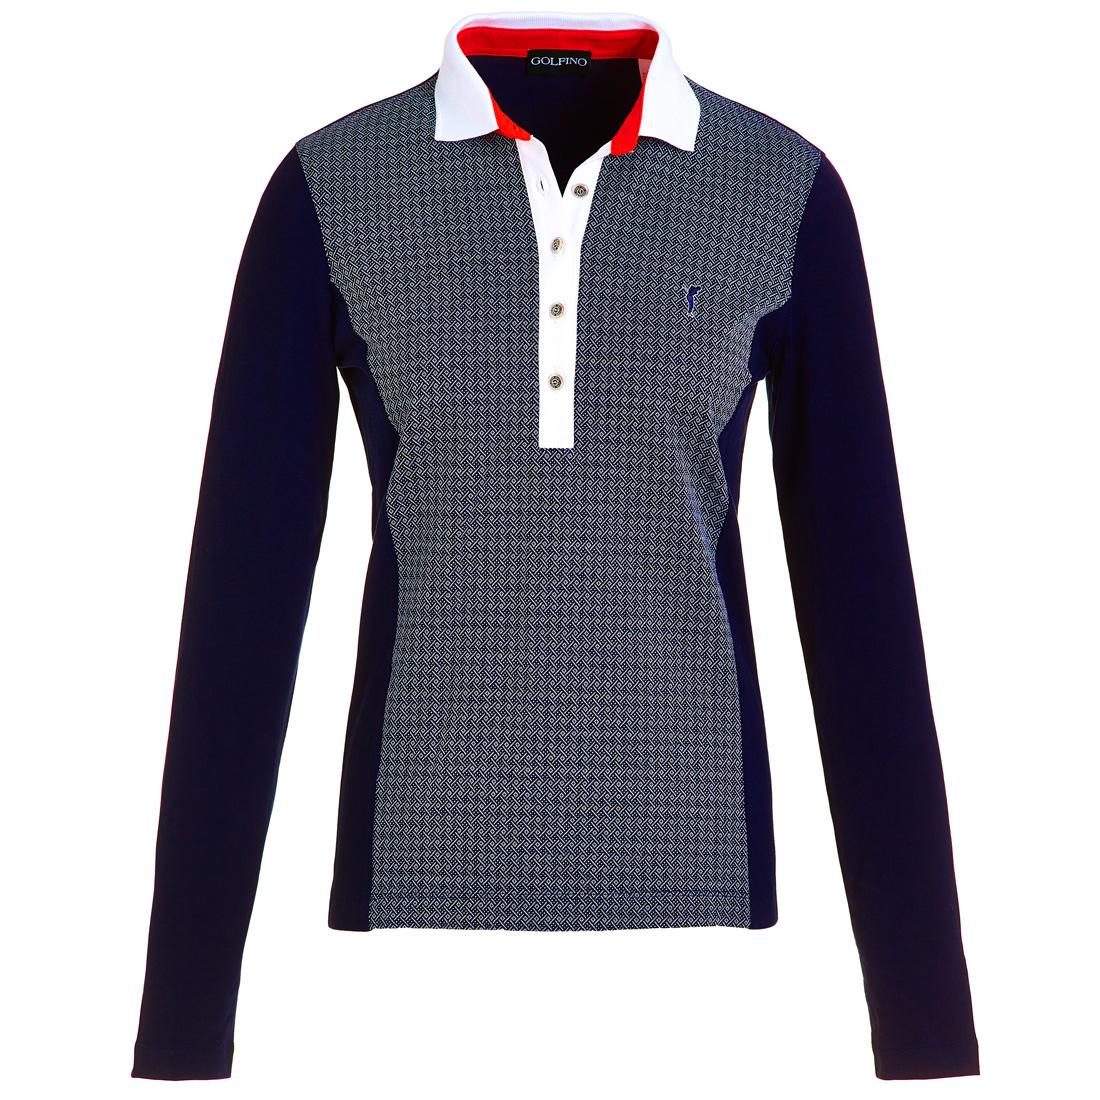 Langarm Jacquard Poloshirt